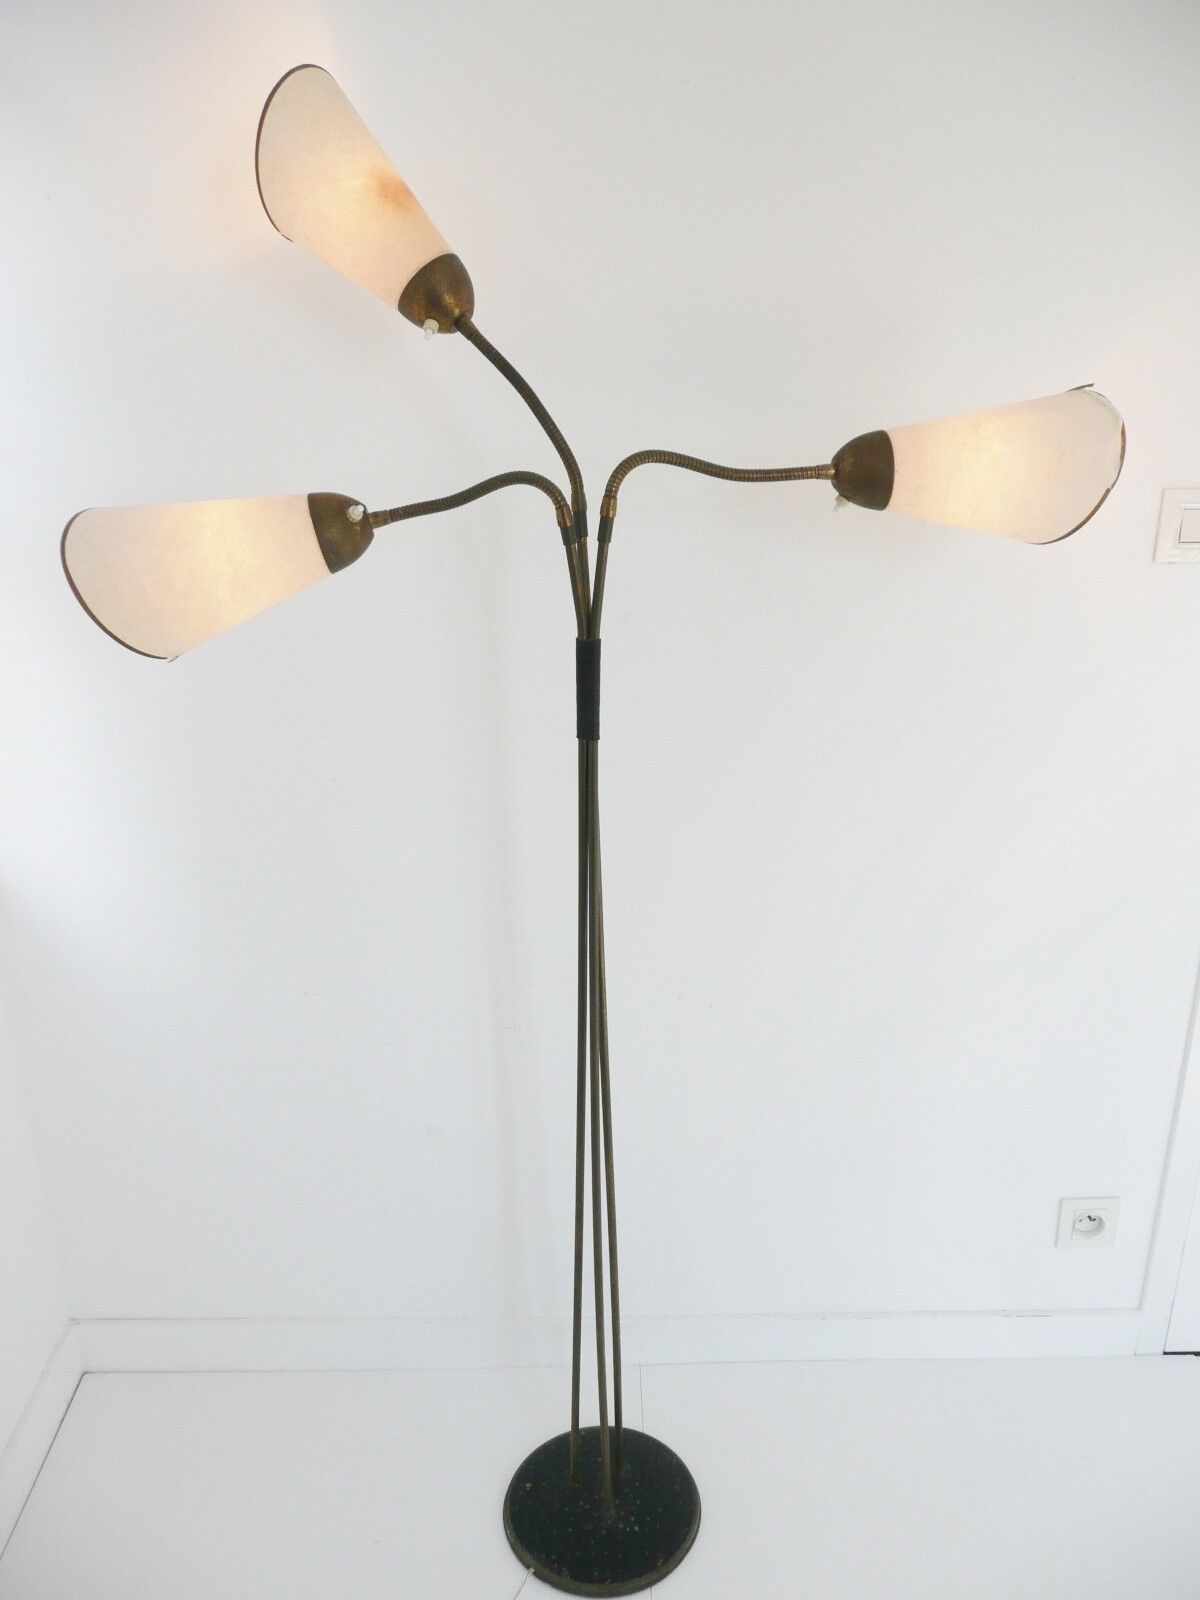 LAMPADAIRE TYPIQUE 1950 A 3 BRAS FLEXIBLES VINTAGE DESIGN ANNEES 50 MID CENTURY